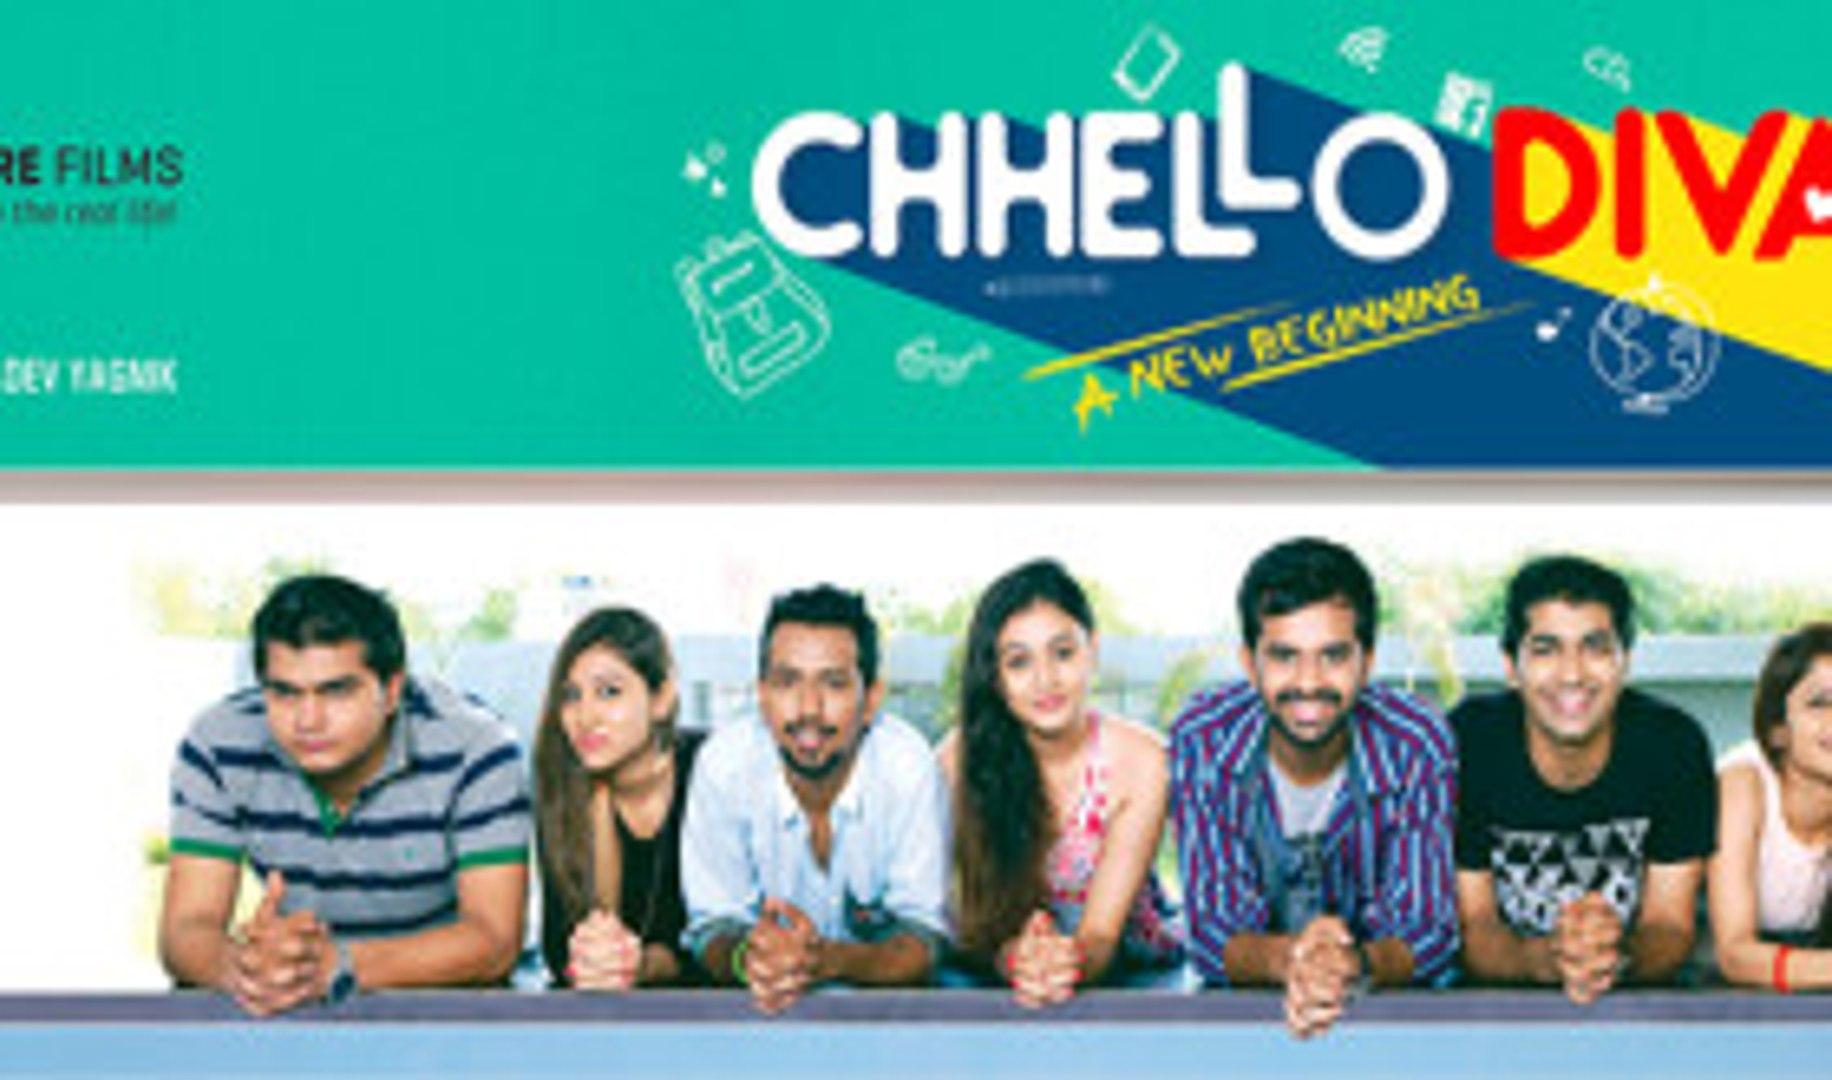 Chhello Divas Gujarati Comedy Movie Theatrical Trailer Hd Hindi Latest 2015 Movies By Bollywood Classic Collection